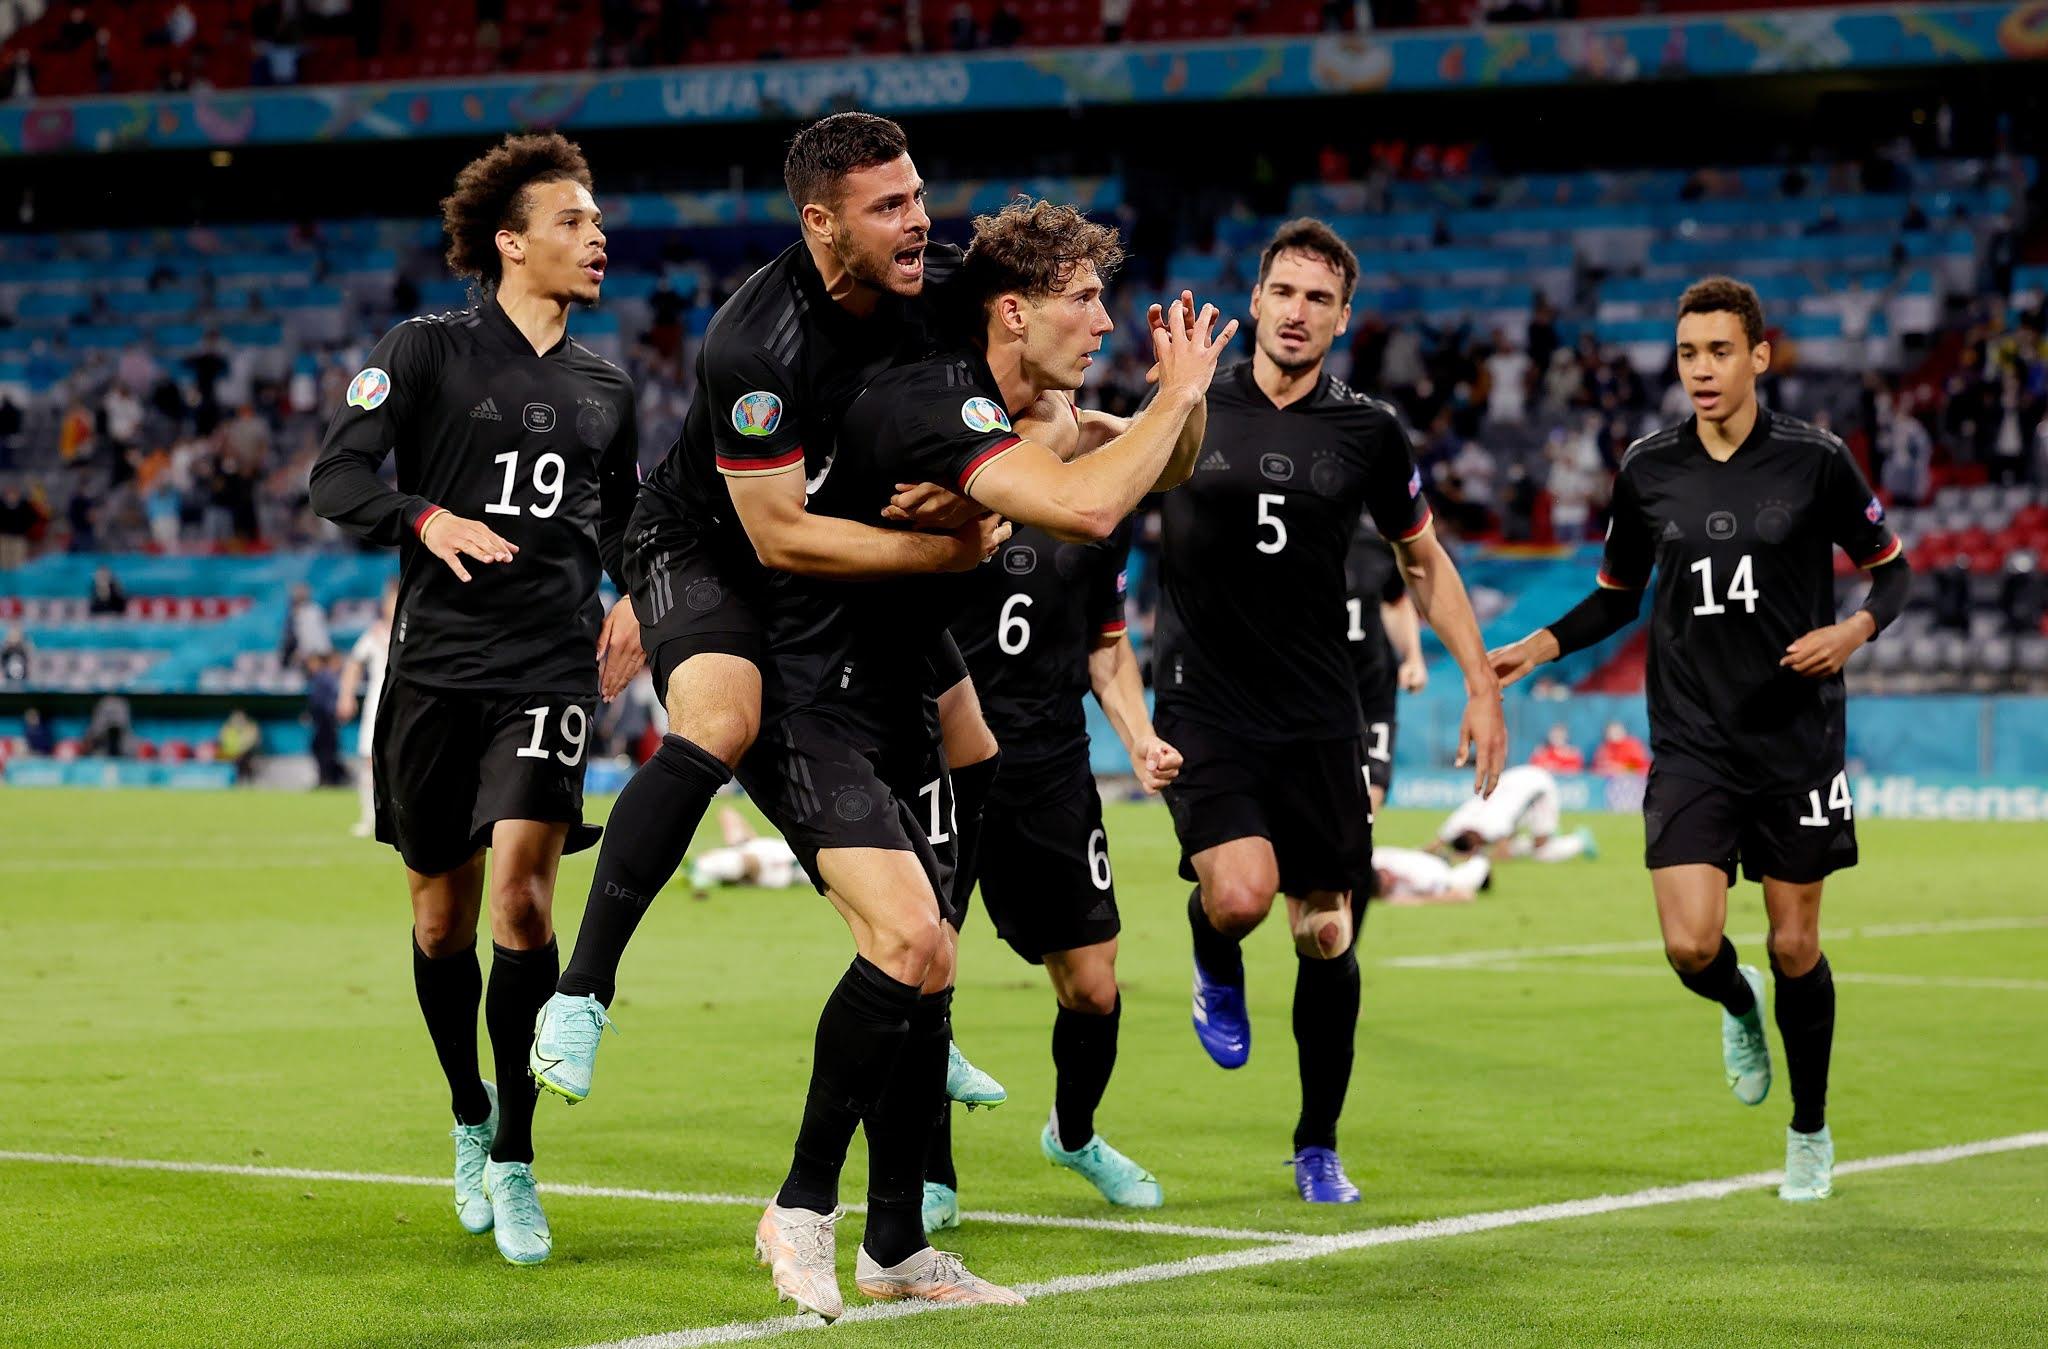 England host Germany at Wembley stadium on Tuesday evening